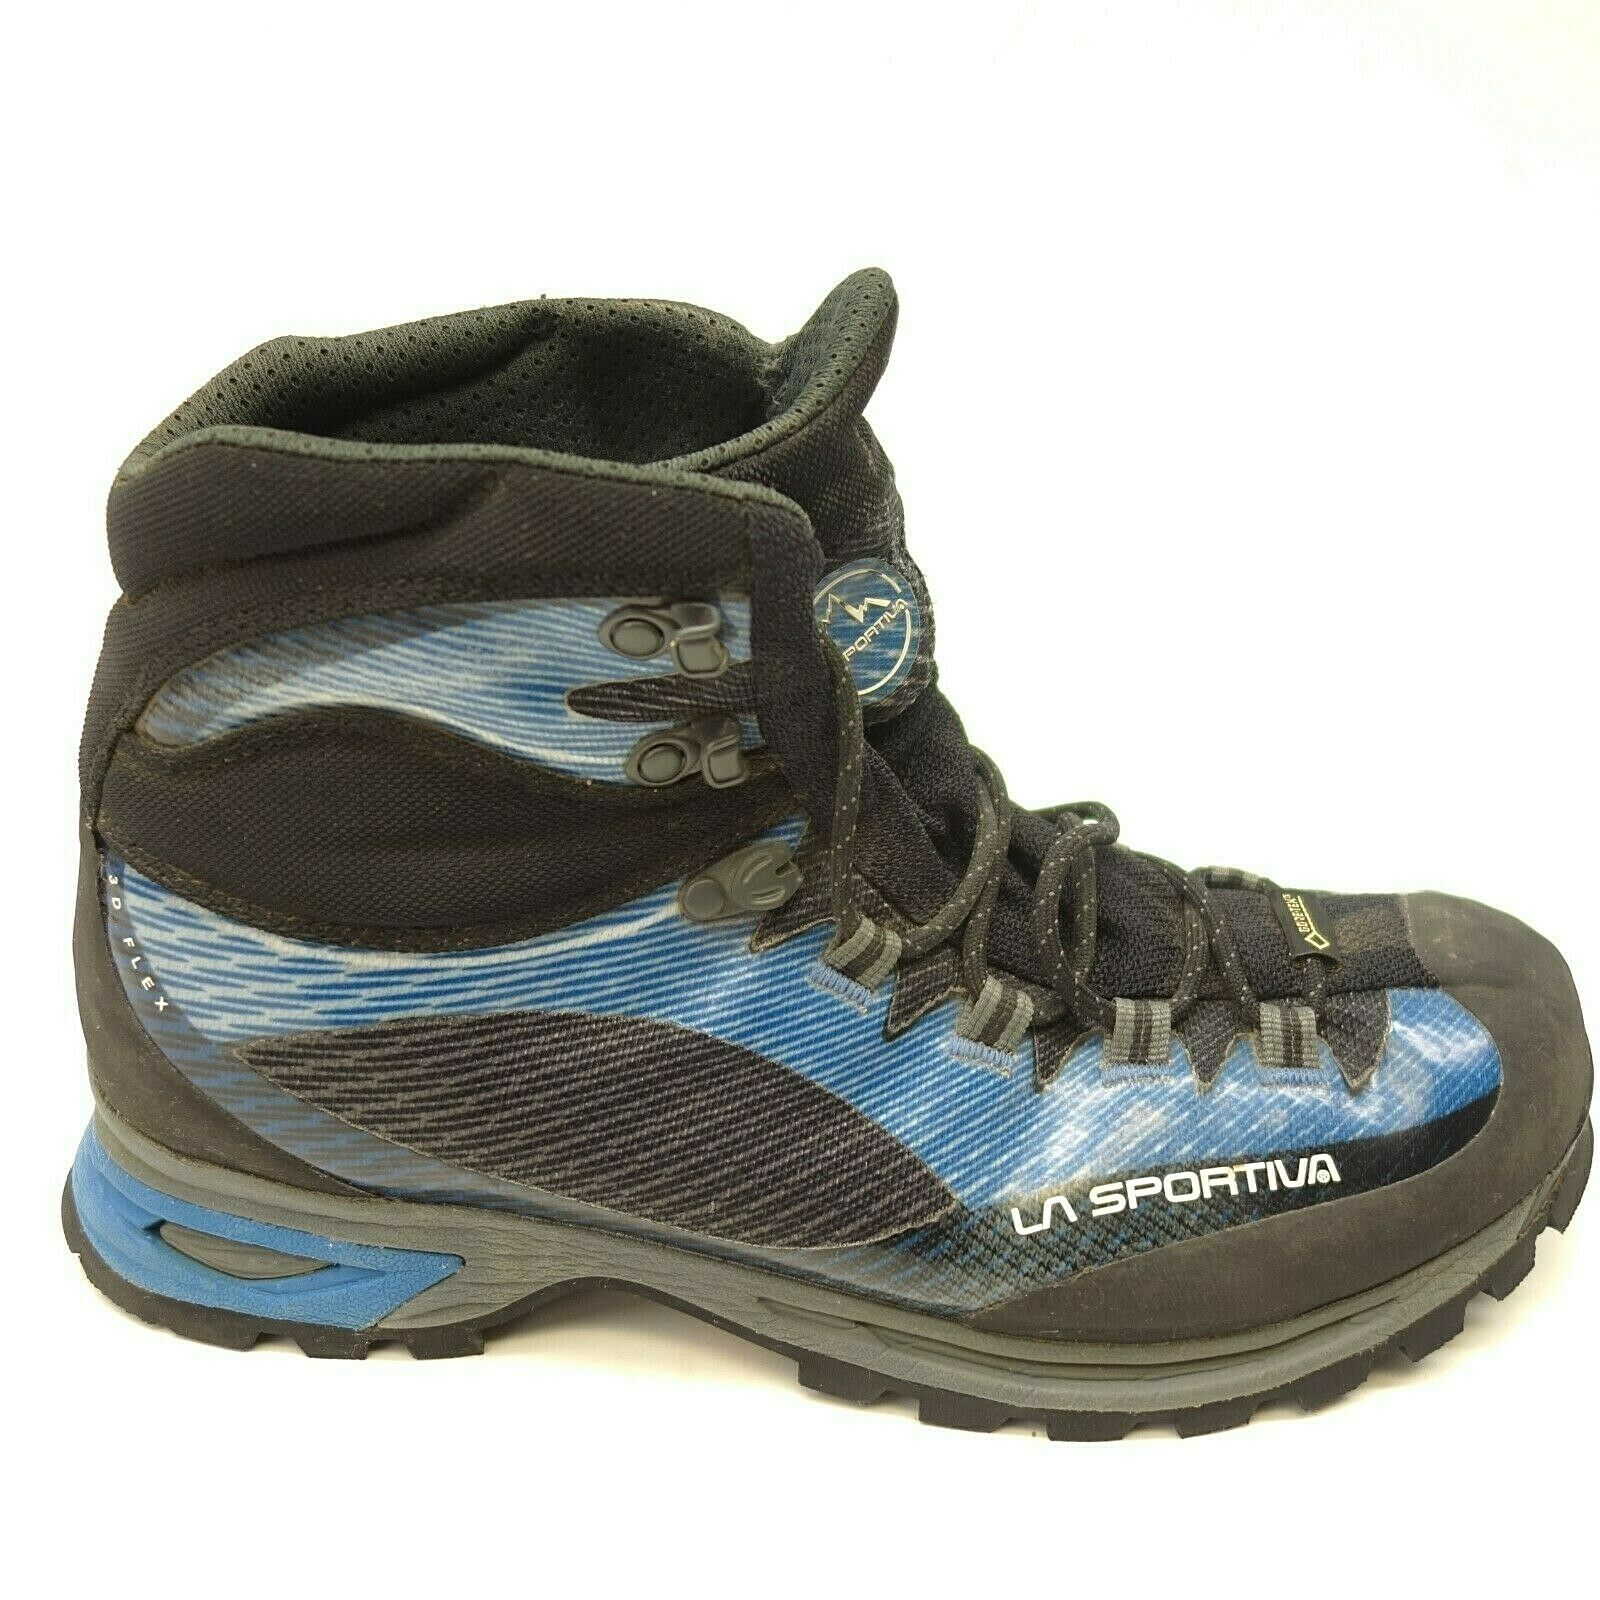 La Sportiva Sz 8.5+ Trango TRK GTX Waterproof Athletic Hiking Mens Boots